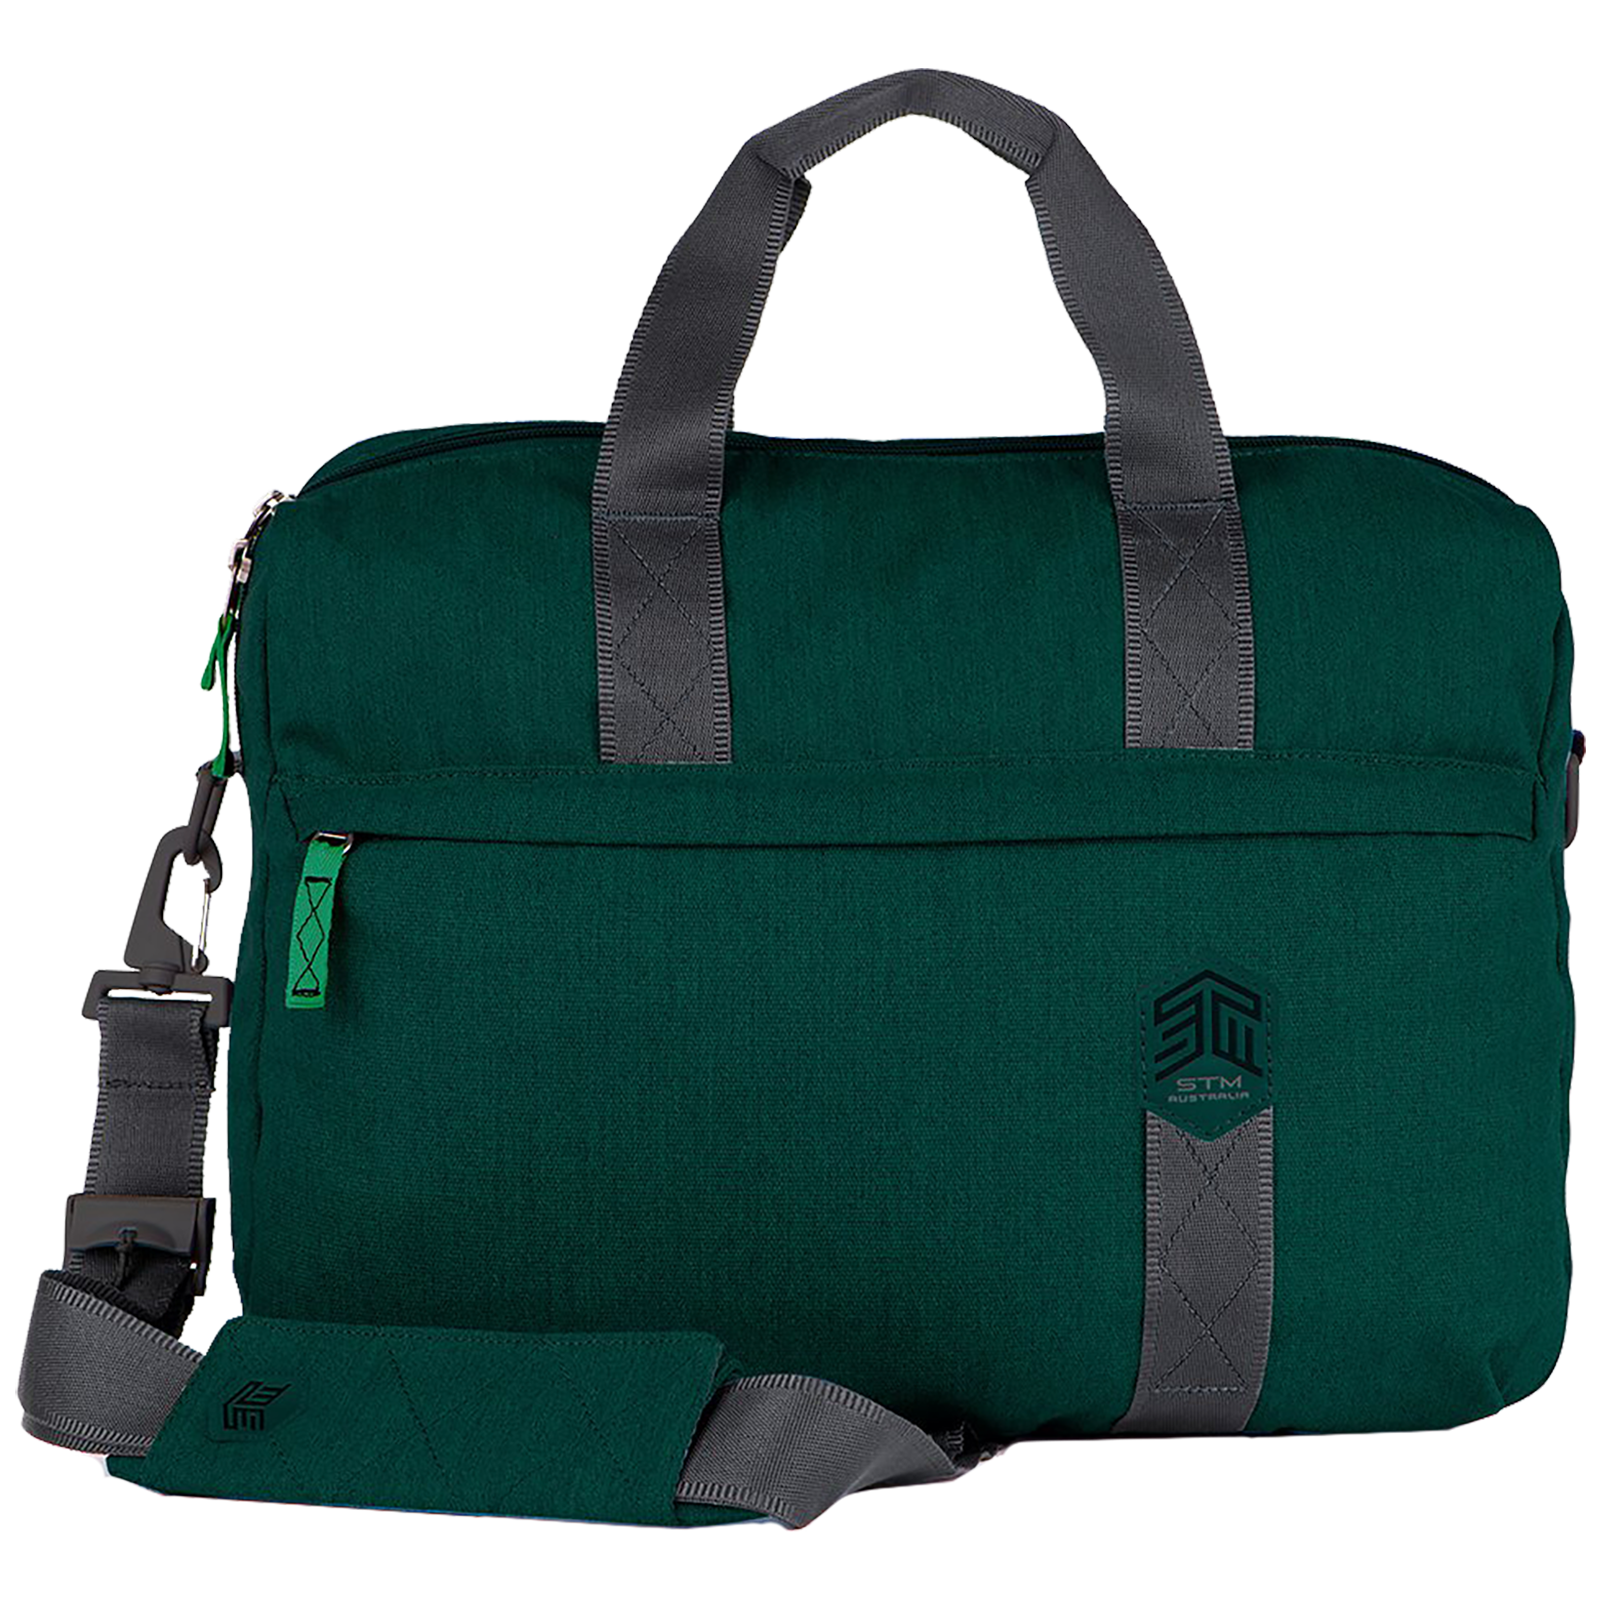 STM Judge Brief 14 Litres Polyester Carry Case for 15 Inch Laptop (SlingTech, STM-112-147P-08, Botanical Green)_1